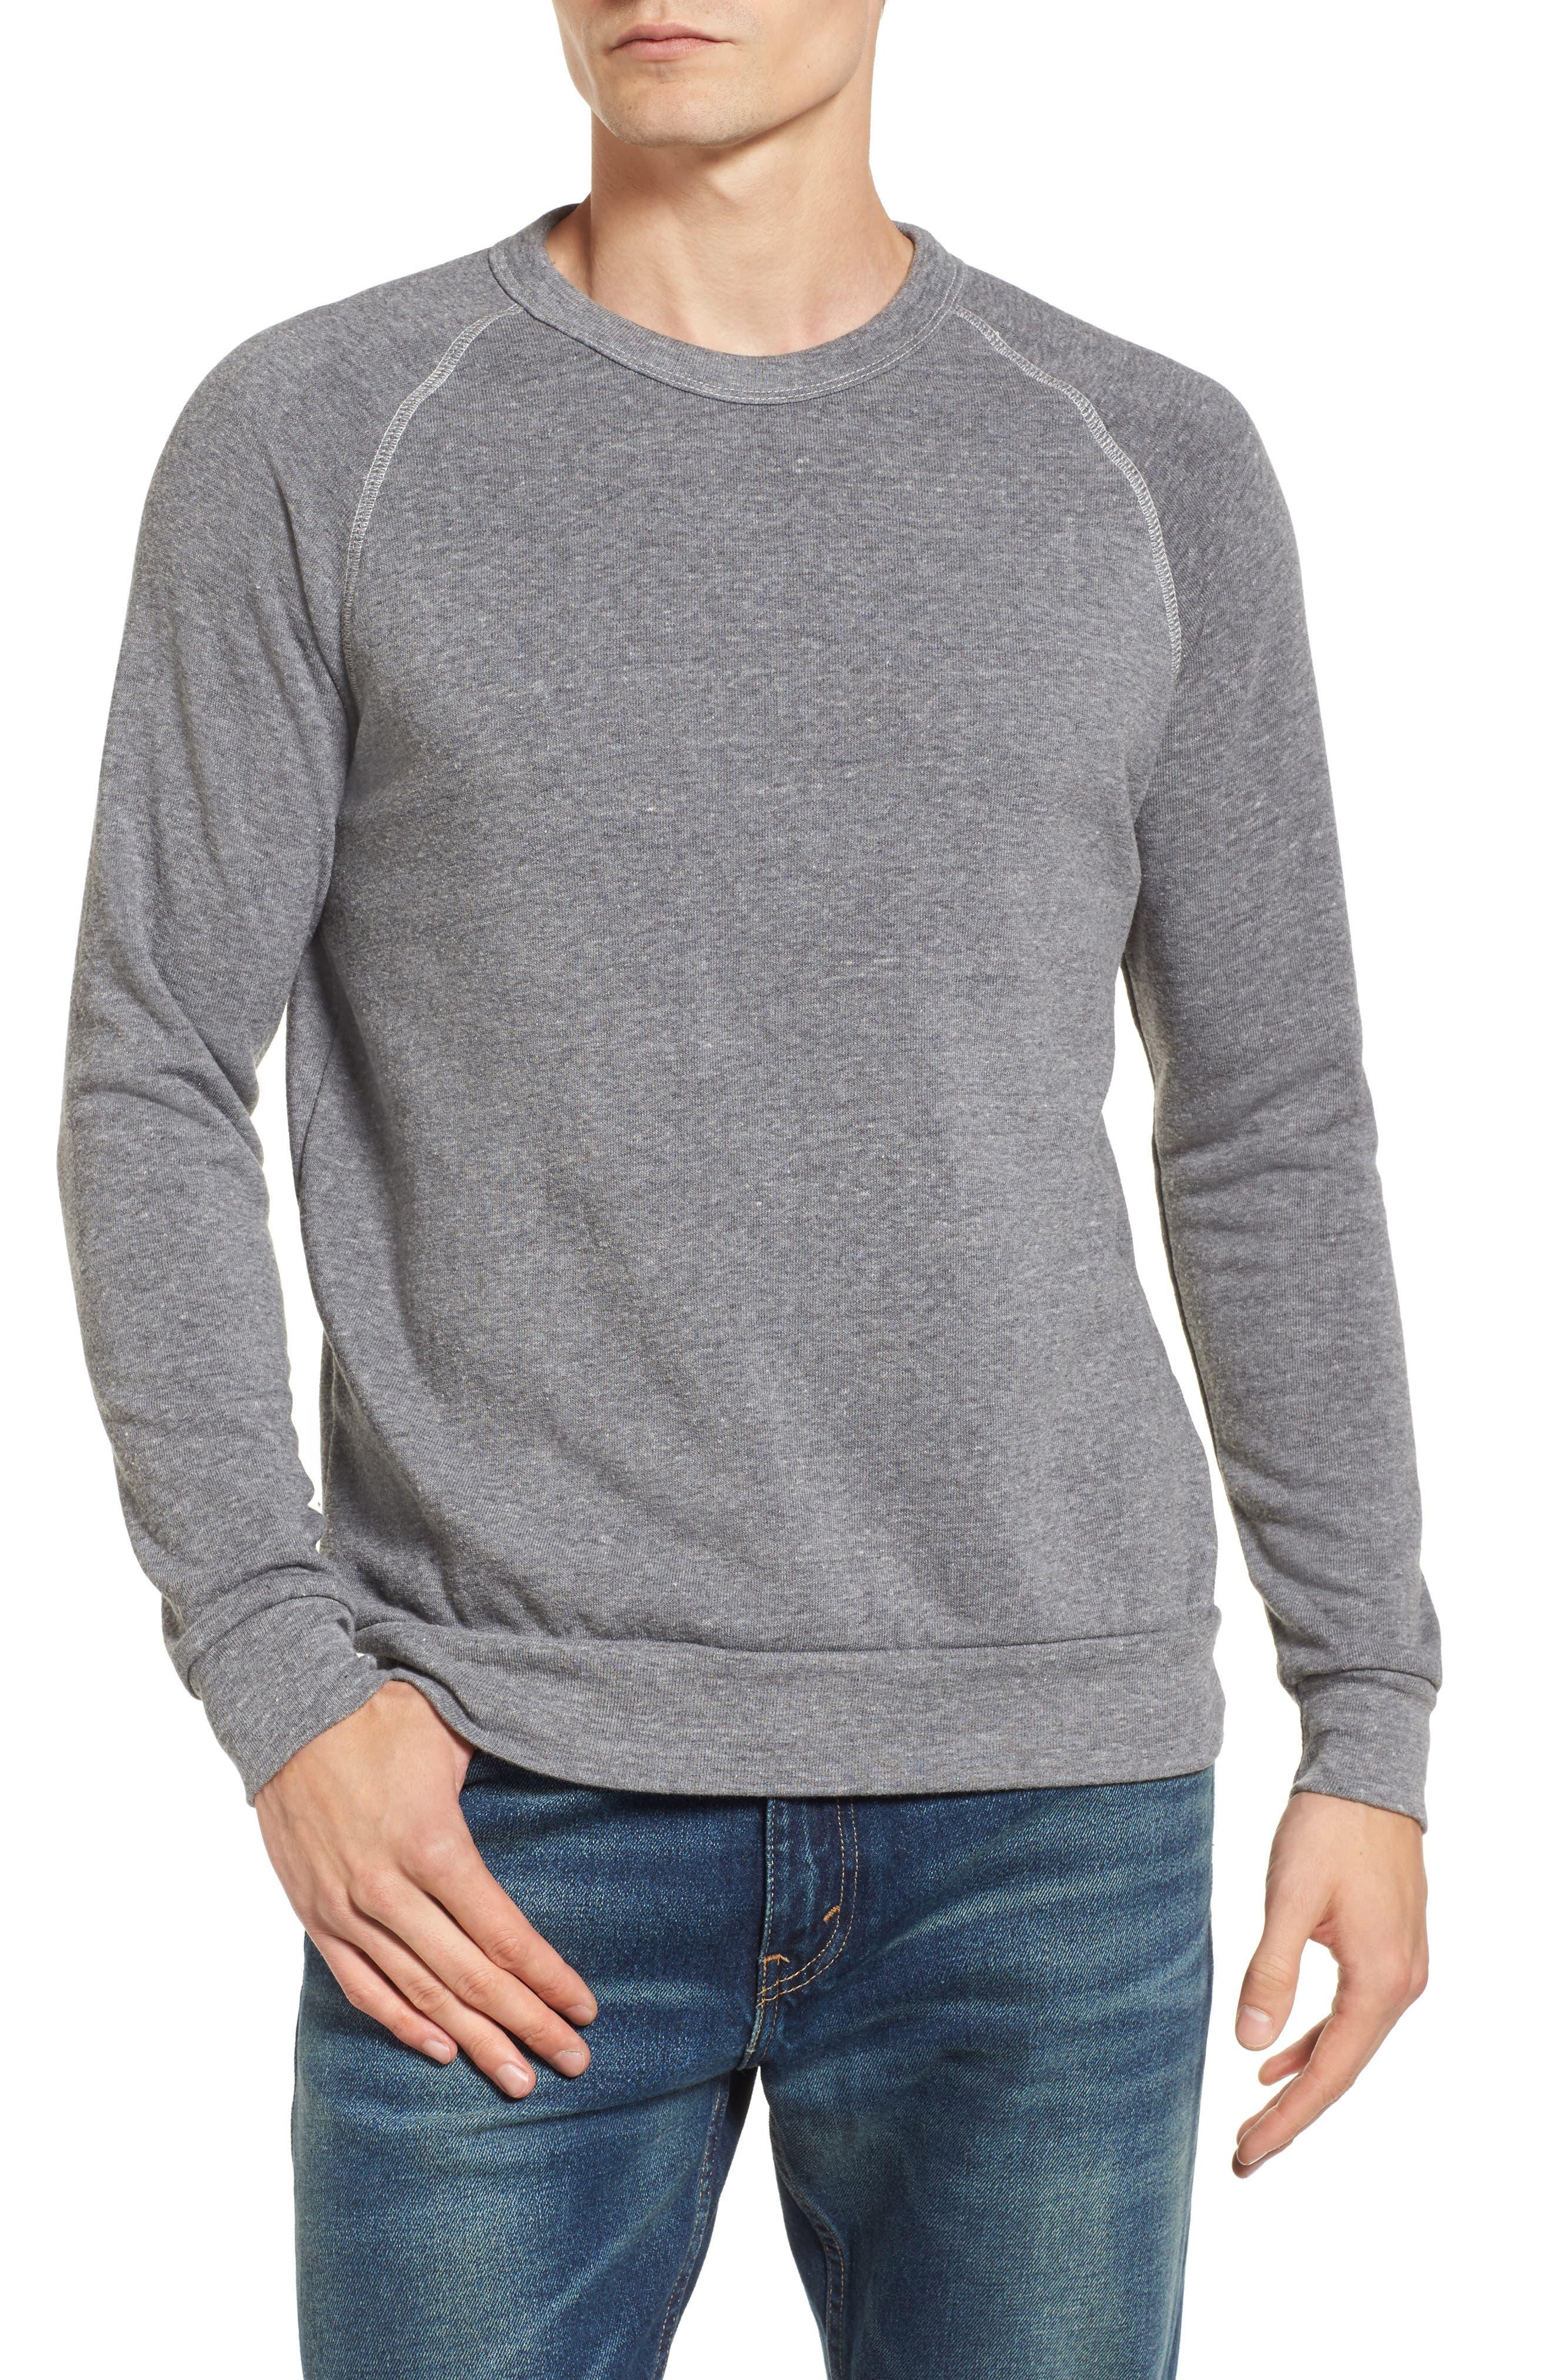 'The Champ' Sweatshirt,                             Main thumbnail 2, color,